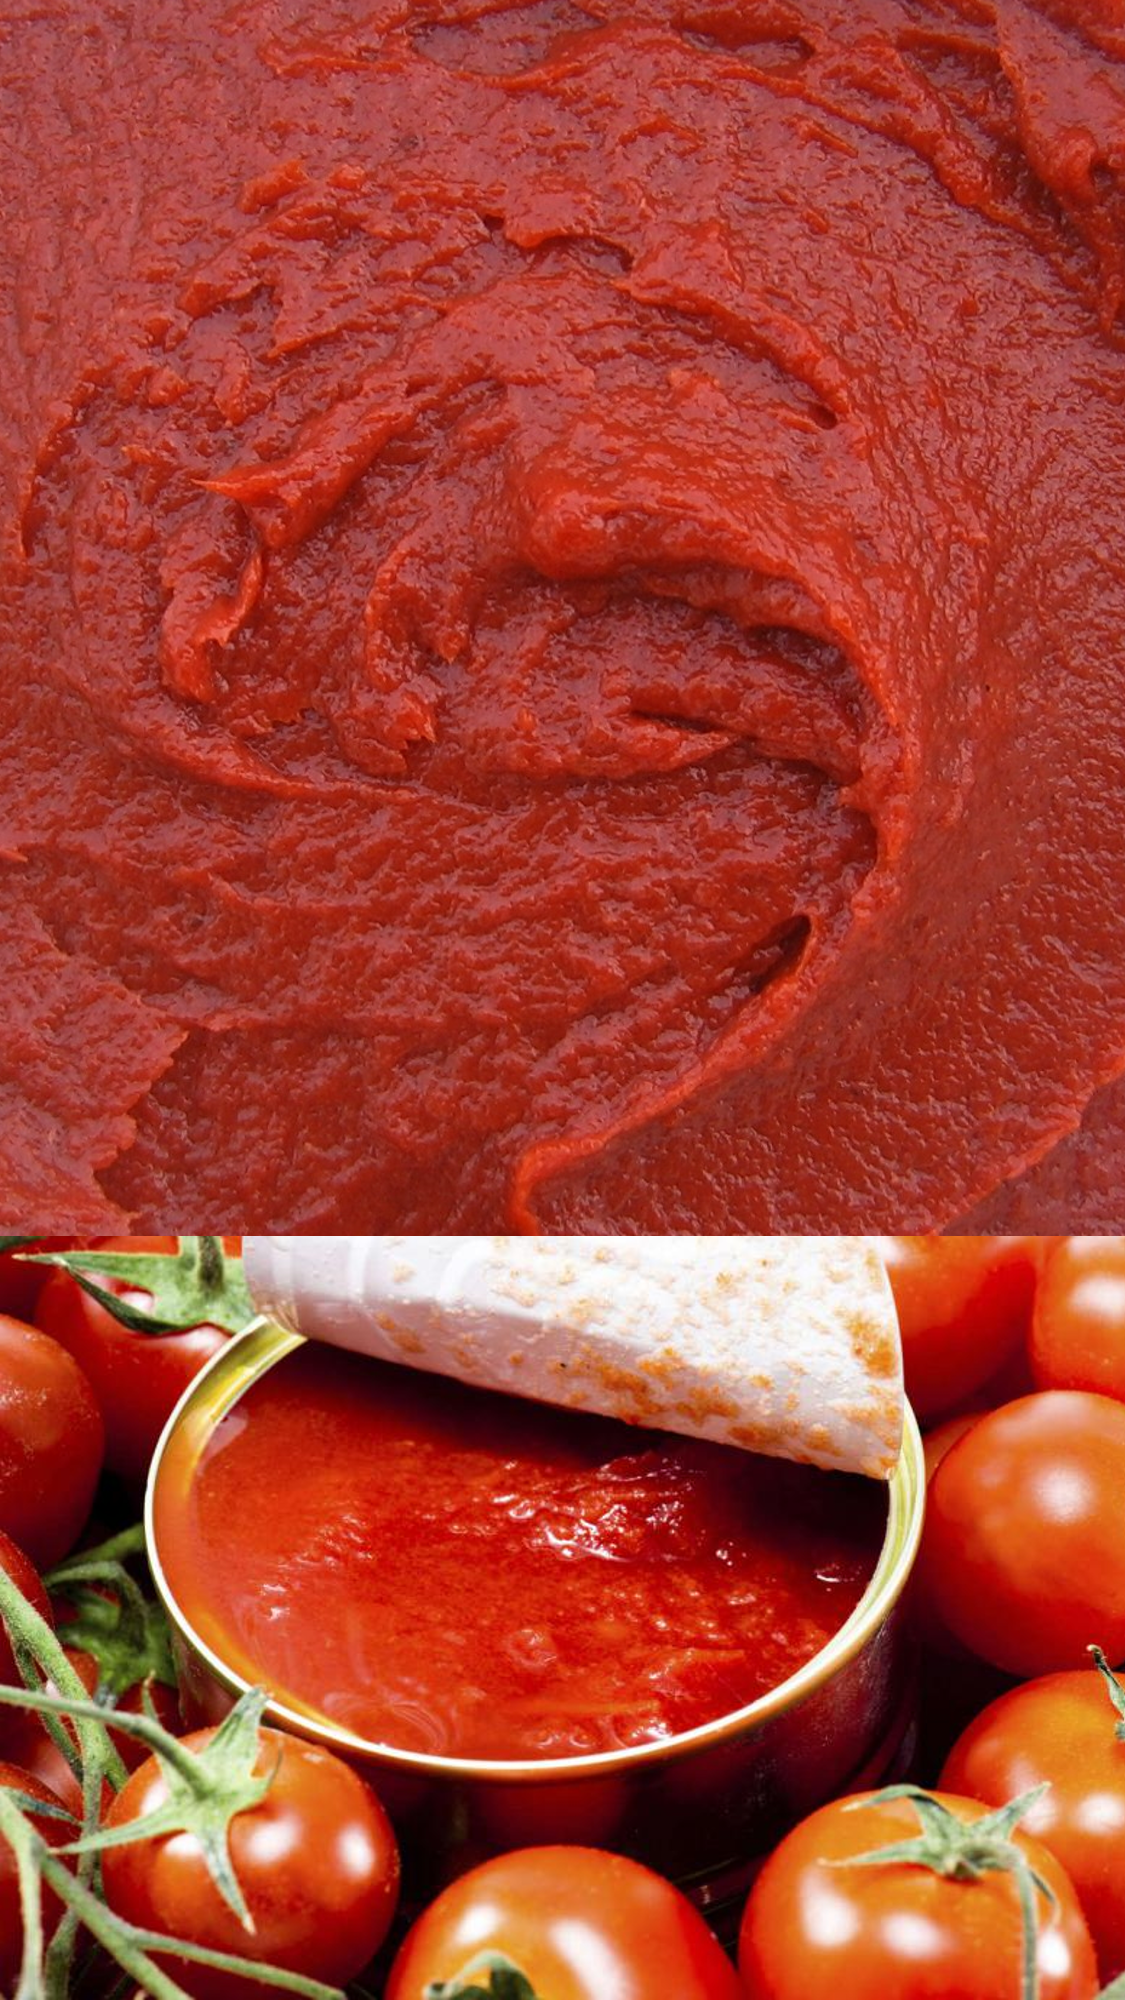 Pasta de Tomate 30/32° brix Hot Break | Pasta Concentrada de Tomate Super Hot Break | Agrozzi, principal productor y proveedor de Pasta de Tomate de Chile